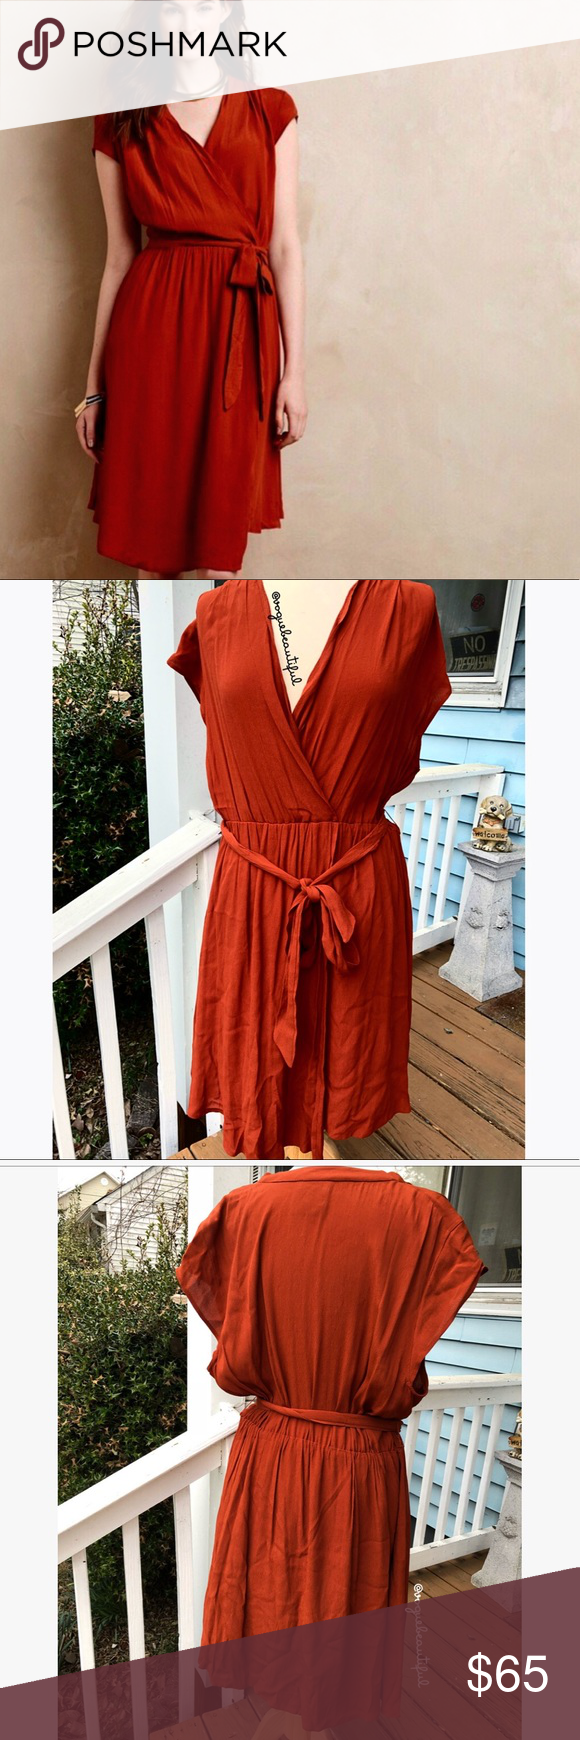 81725184d855 Maeve Noronha Wrap Dress Rust Maeve {Anthropologie} Noronha wrap dress in  rust - size